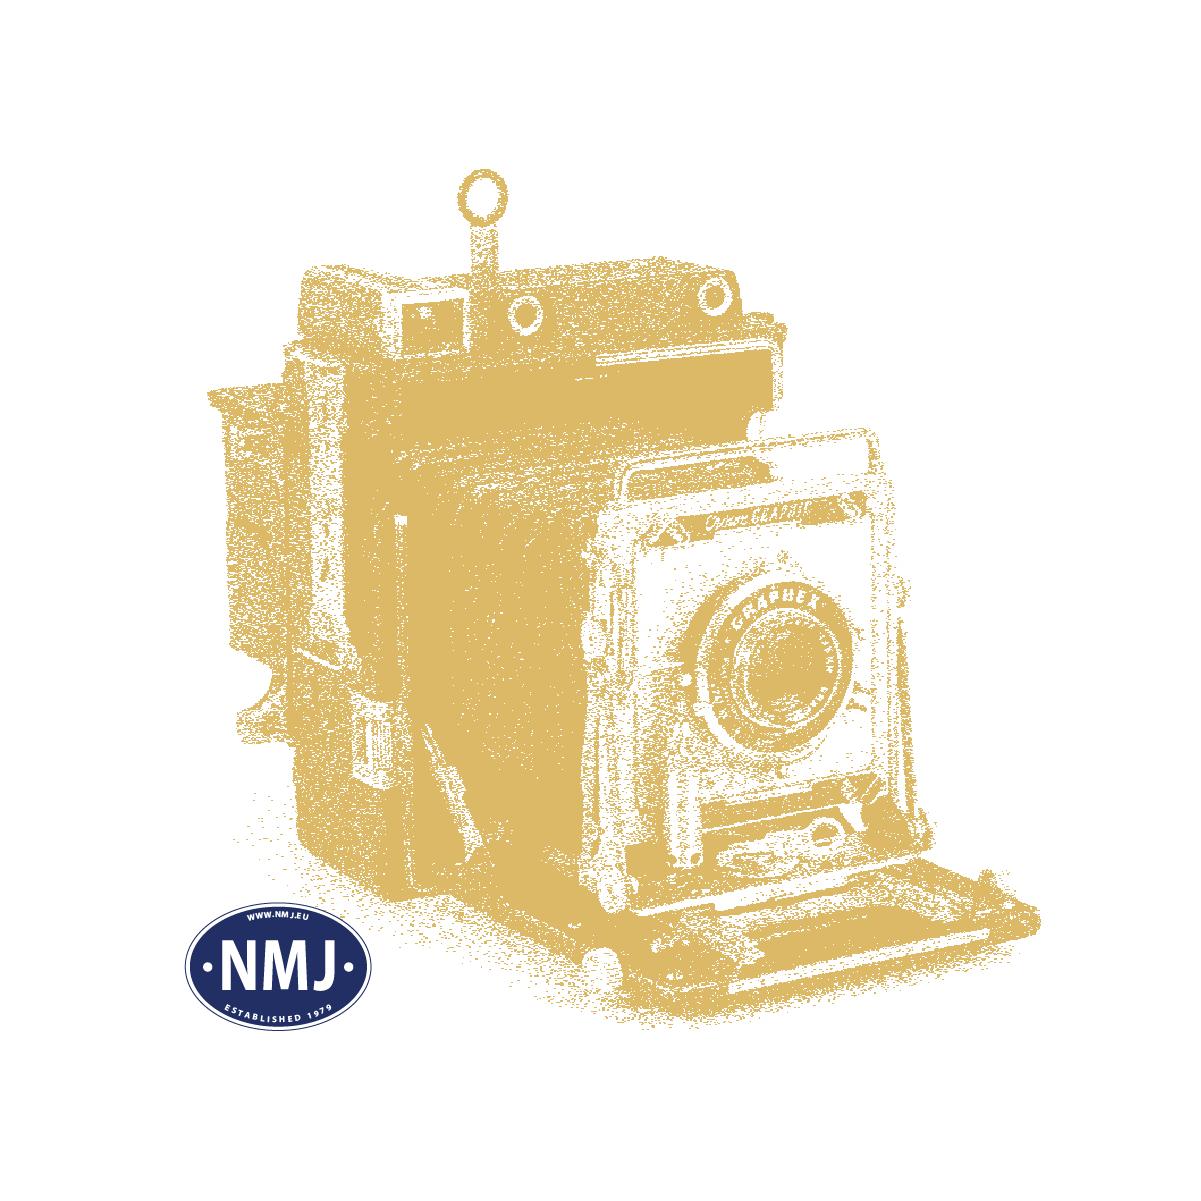 NOC15275 - Rangierpersonal